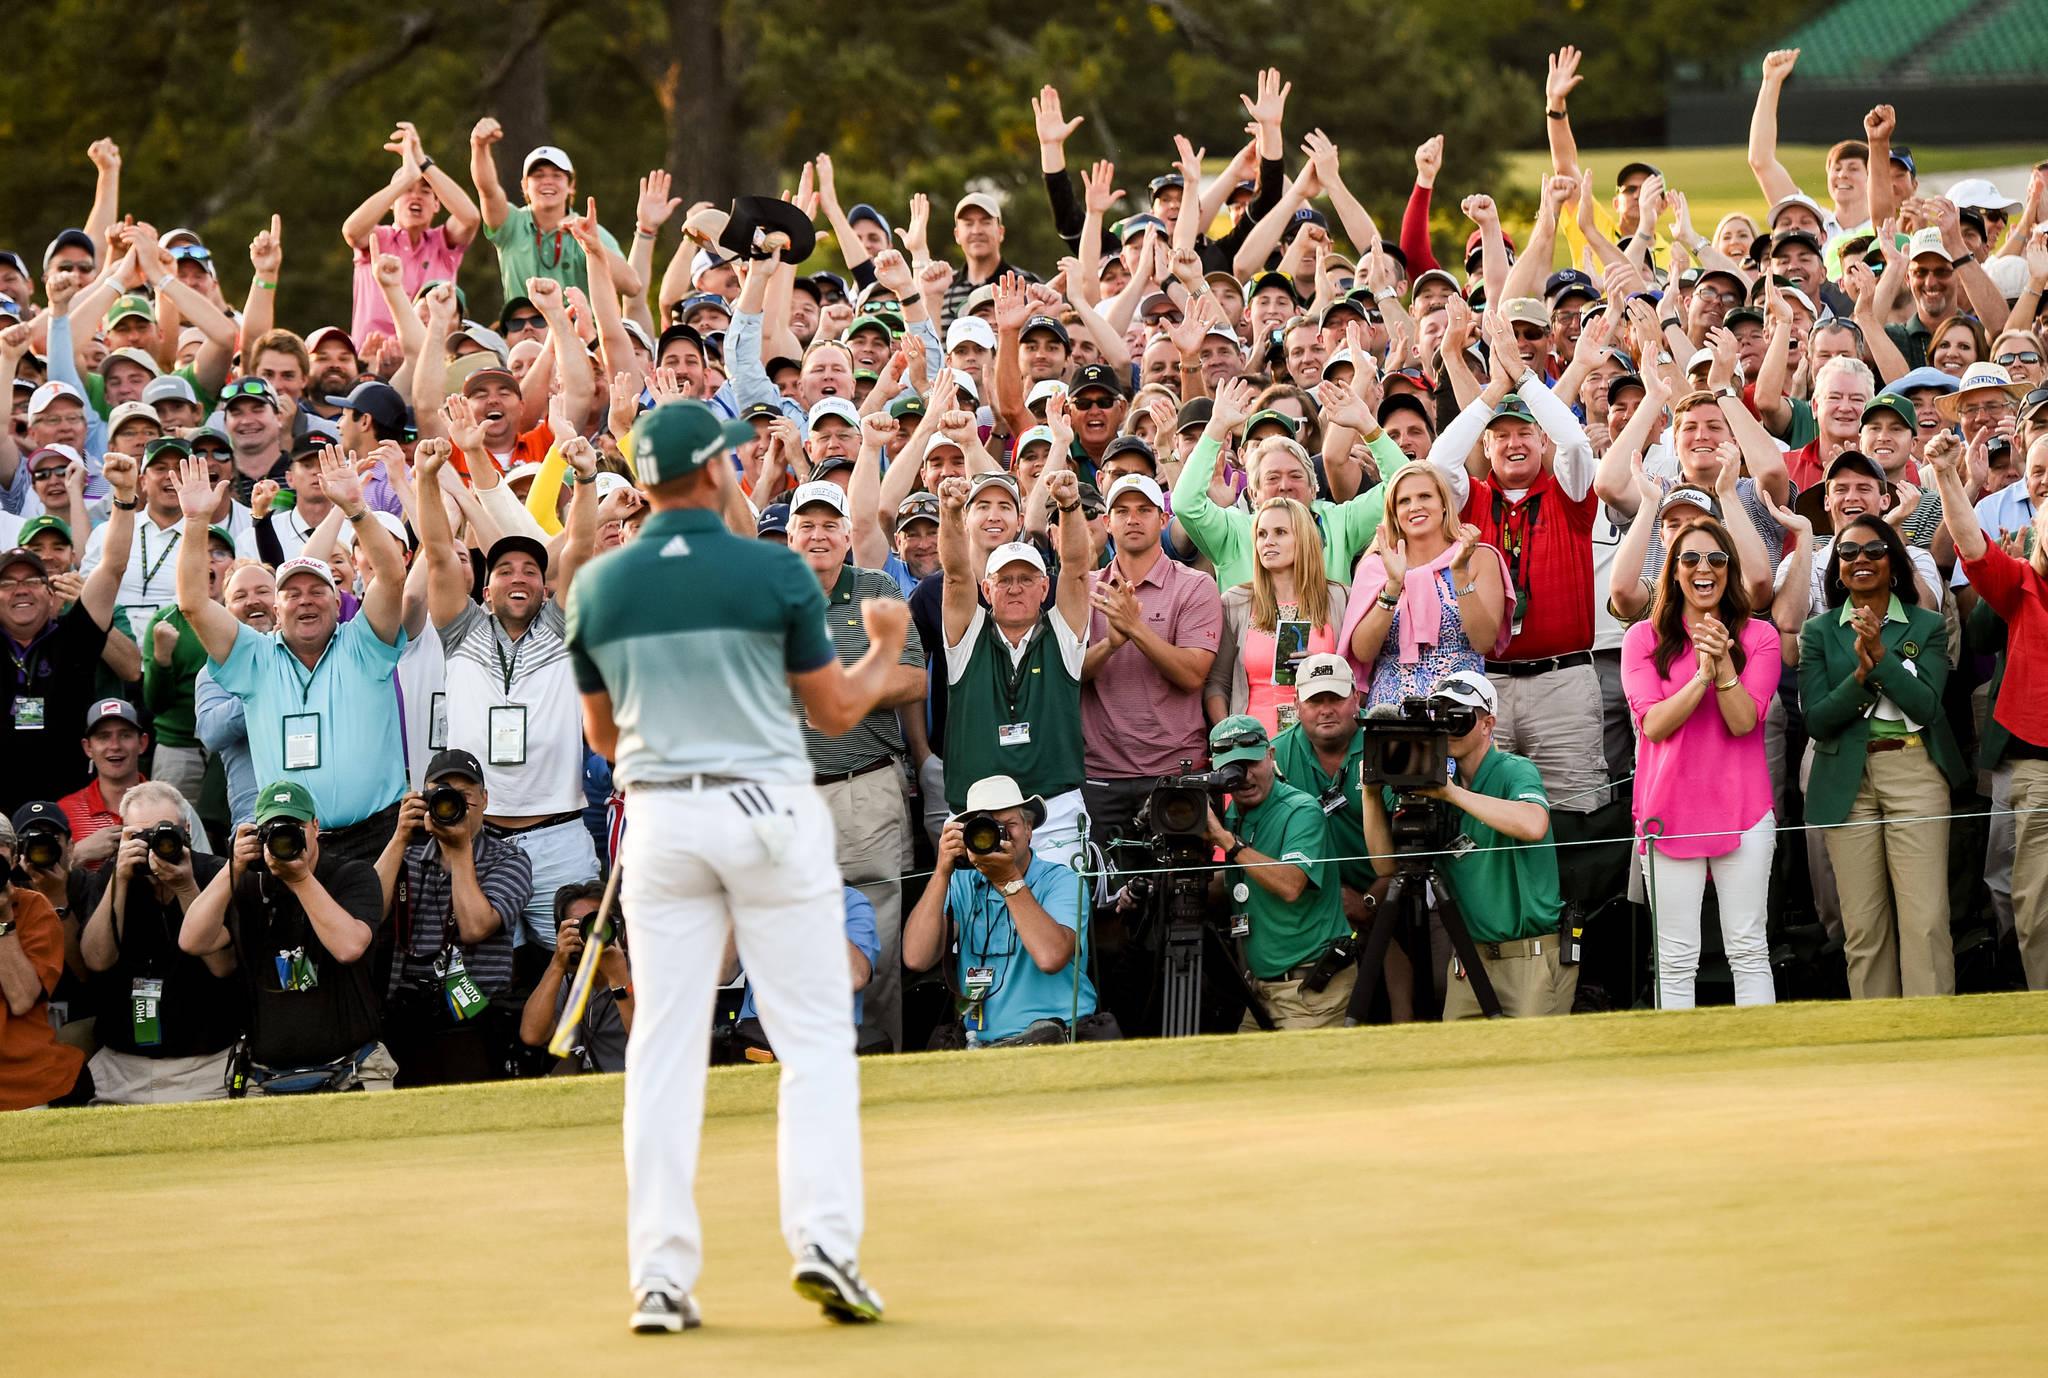 Garcia wins Masters playoff to claim green jacket